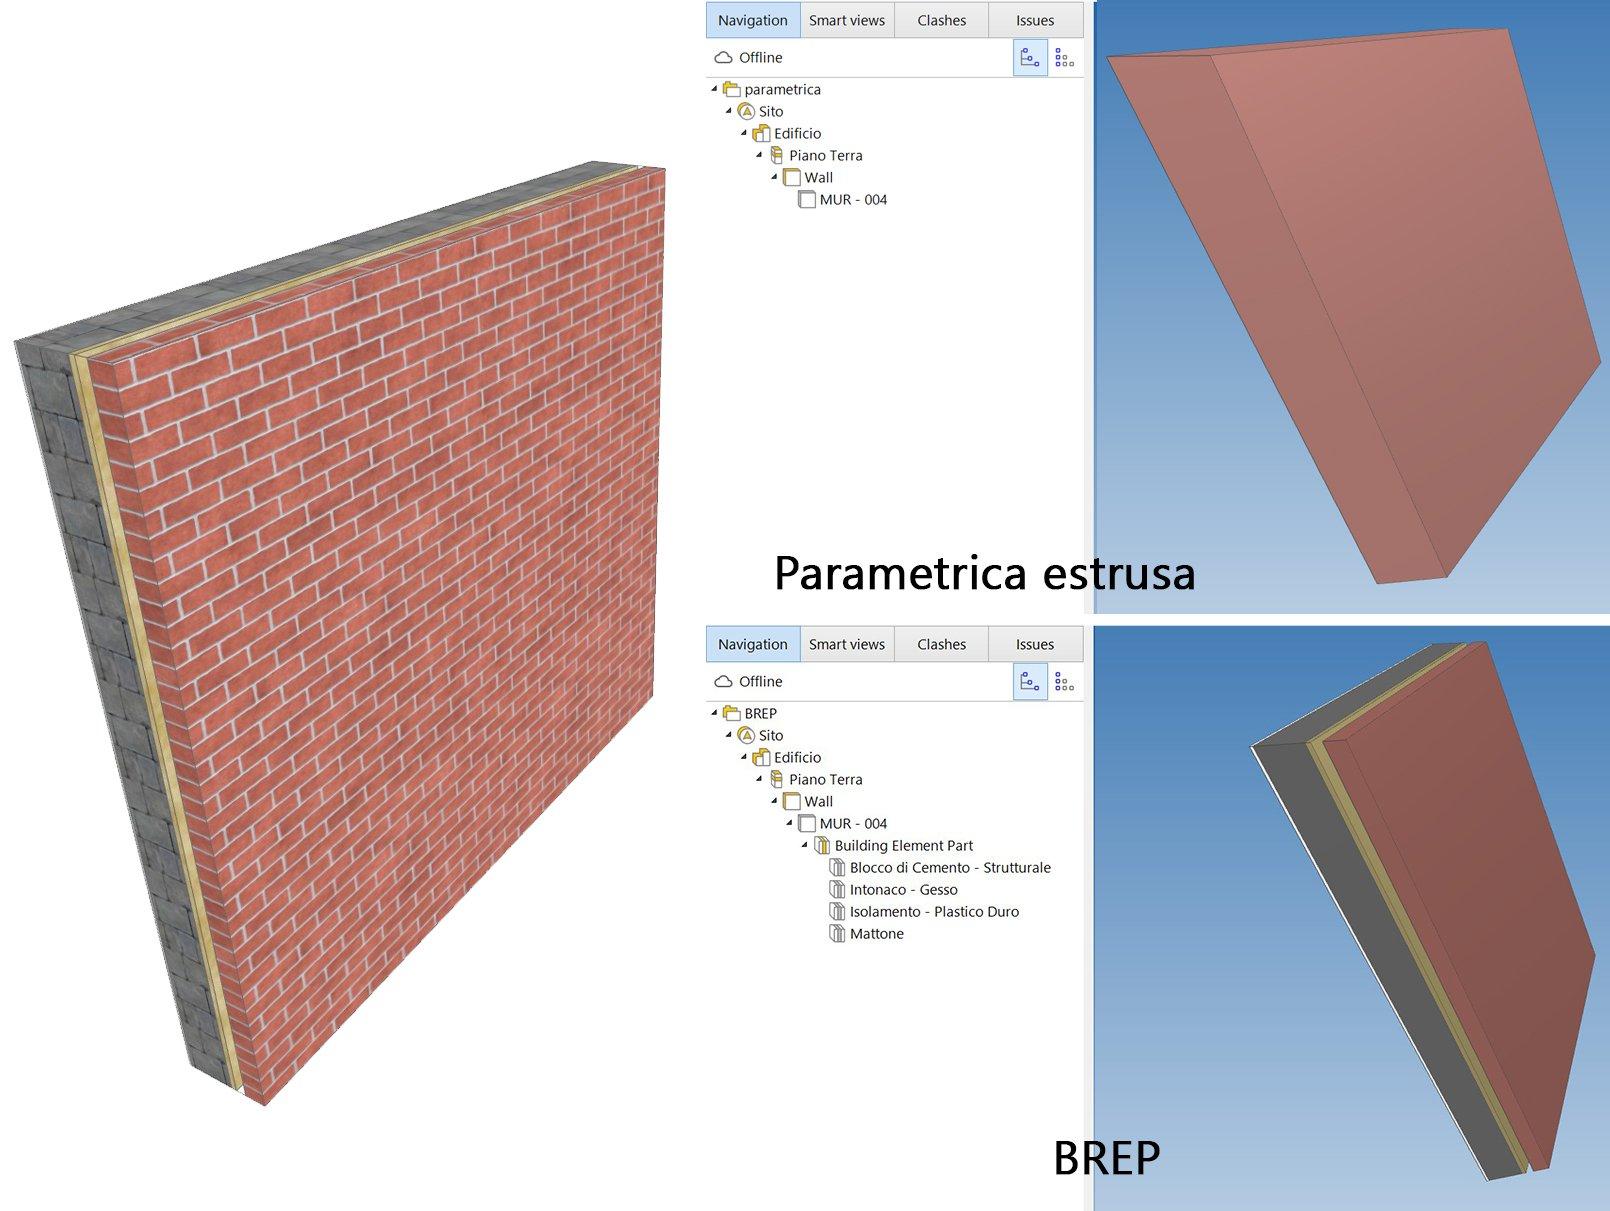 IfcRelDecomposes e Geometria